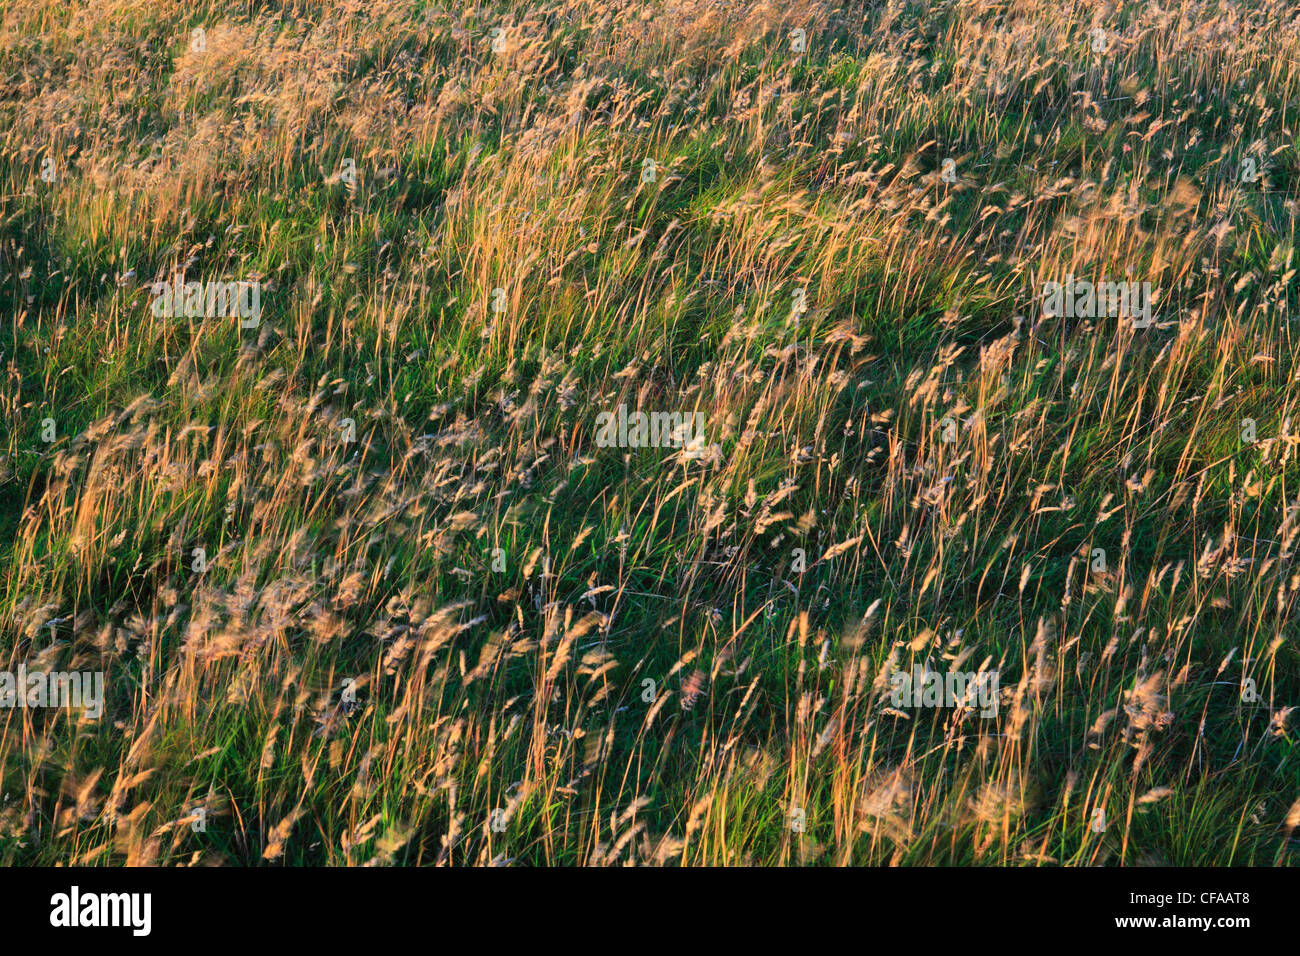 Detail, grass, surging, high-level moor, Scotland, marsh, marsh grass, brown, wind - Stock Image